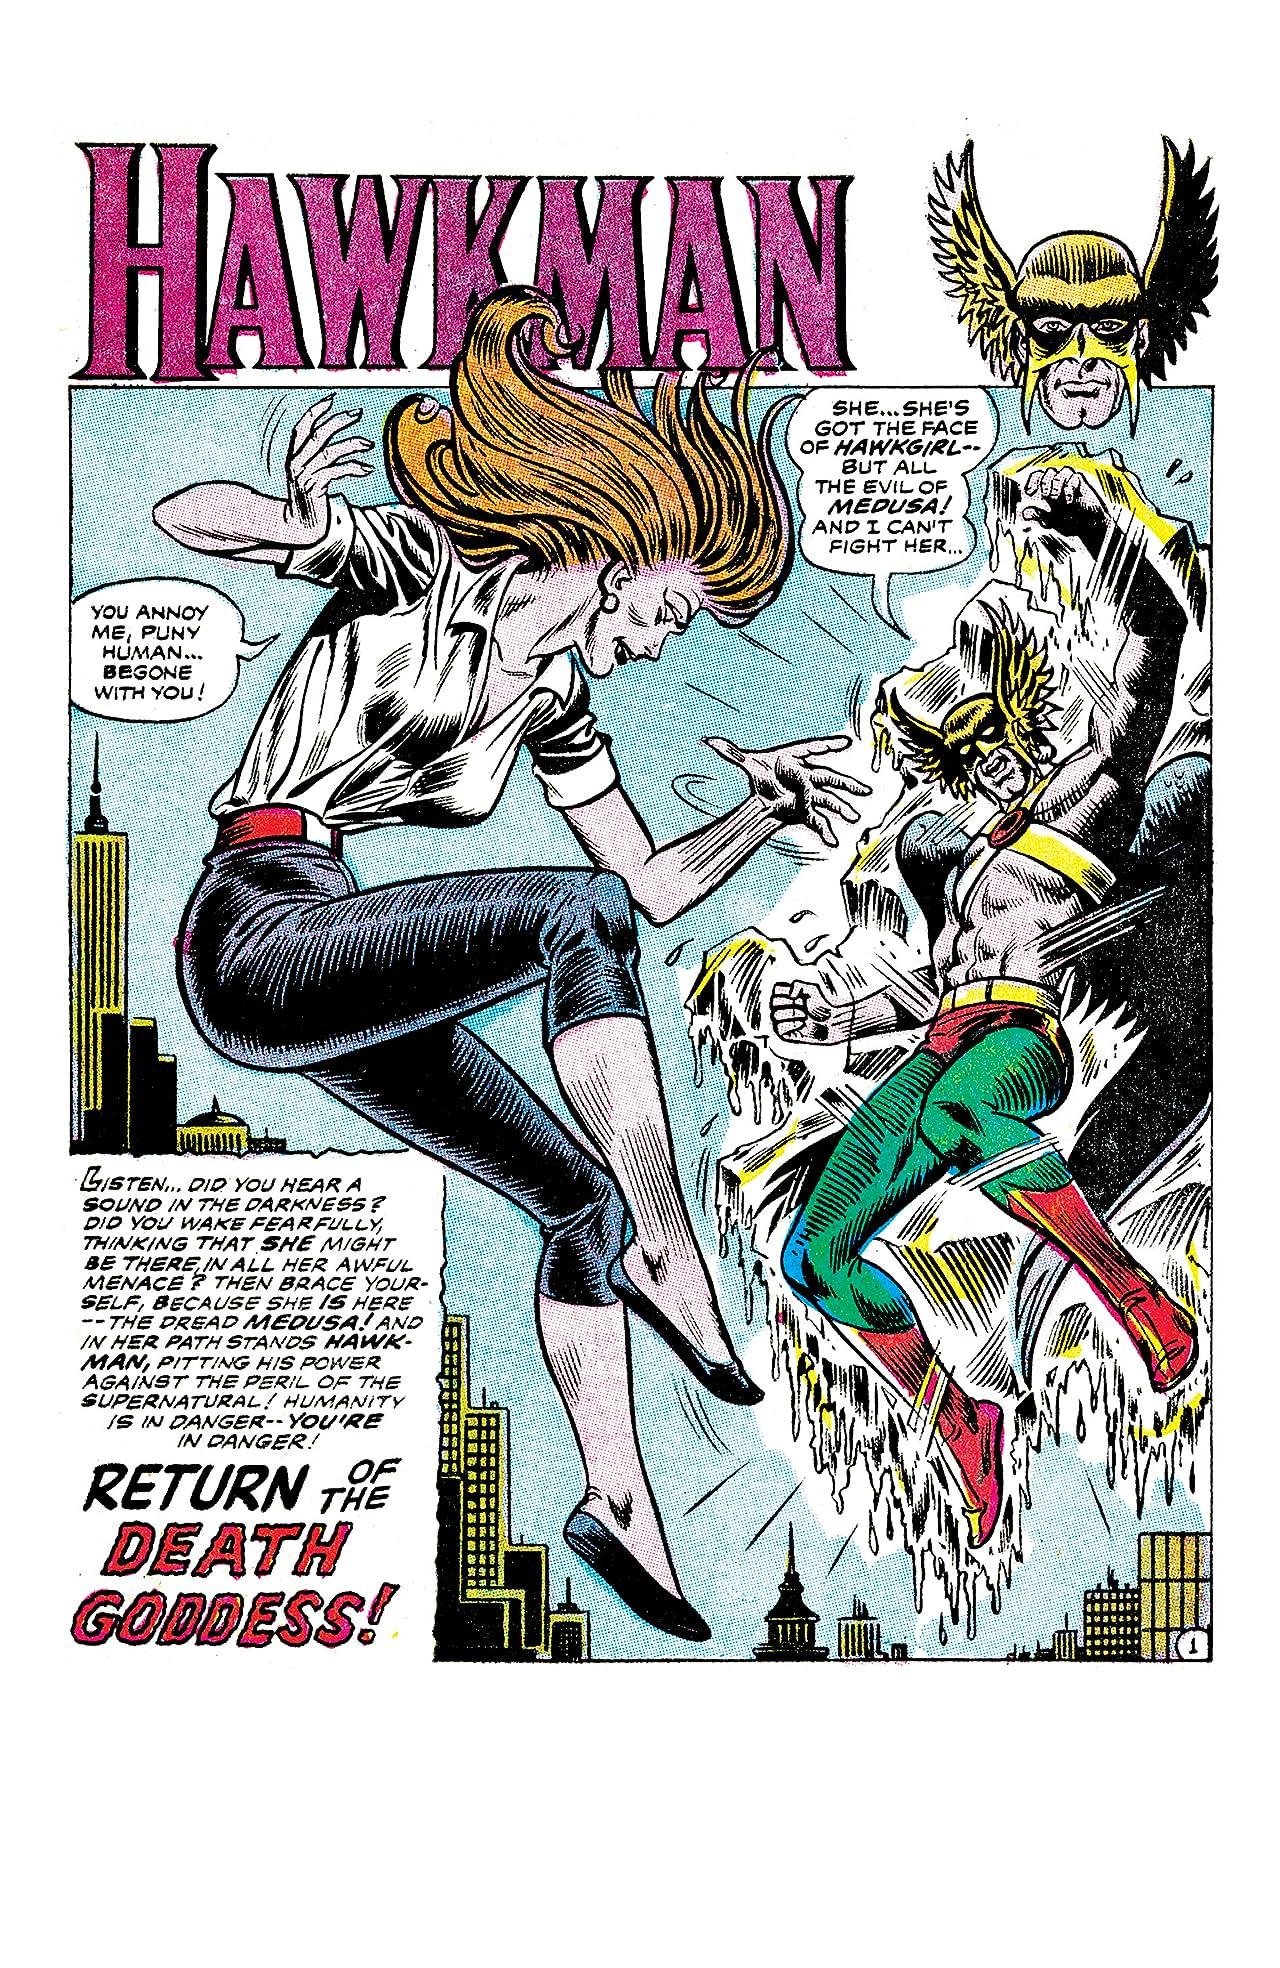 Hawkman (1964-1968) #25